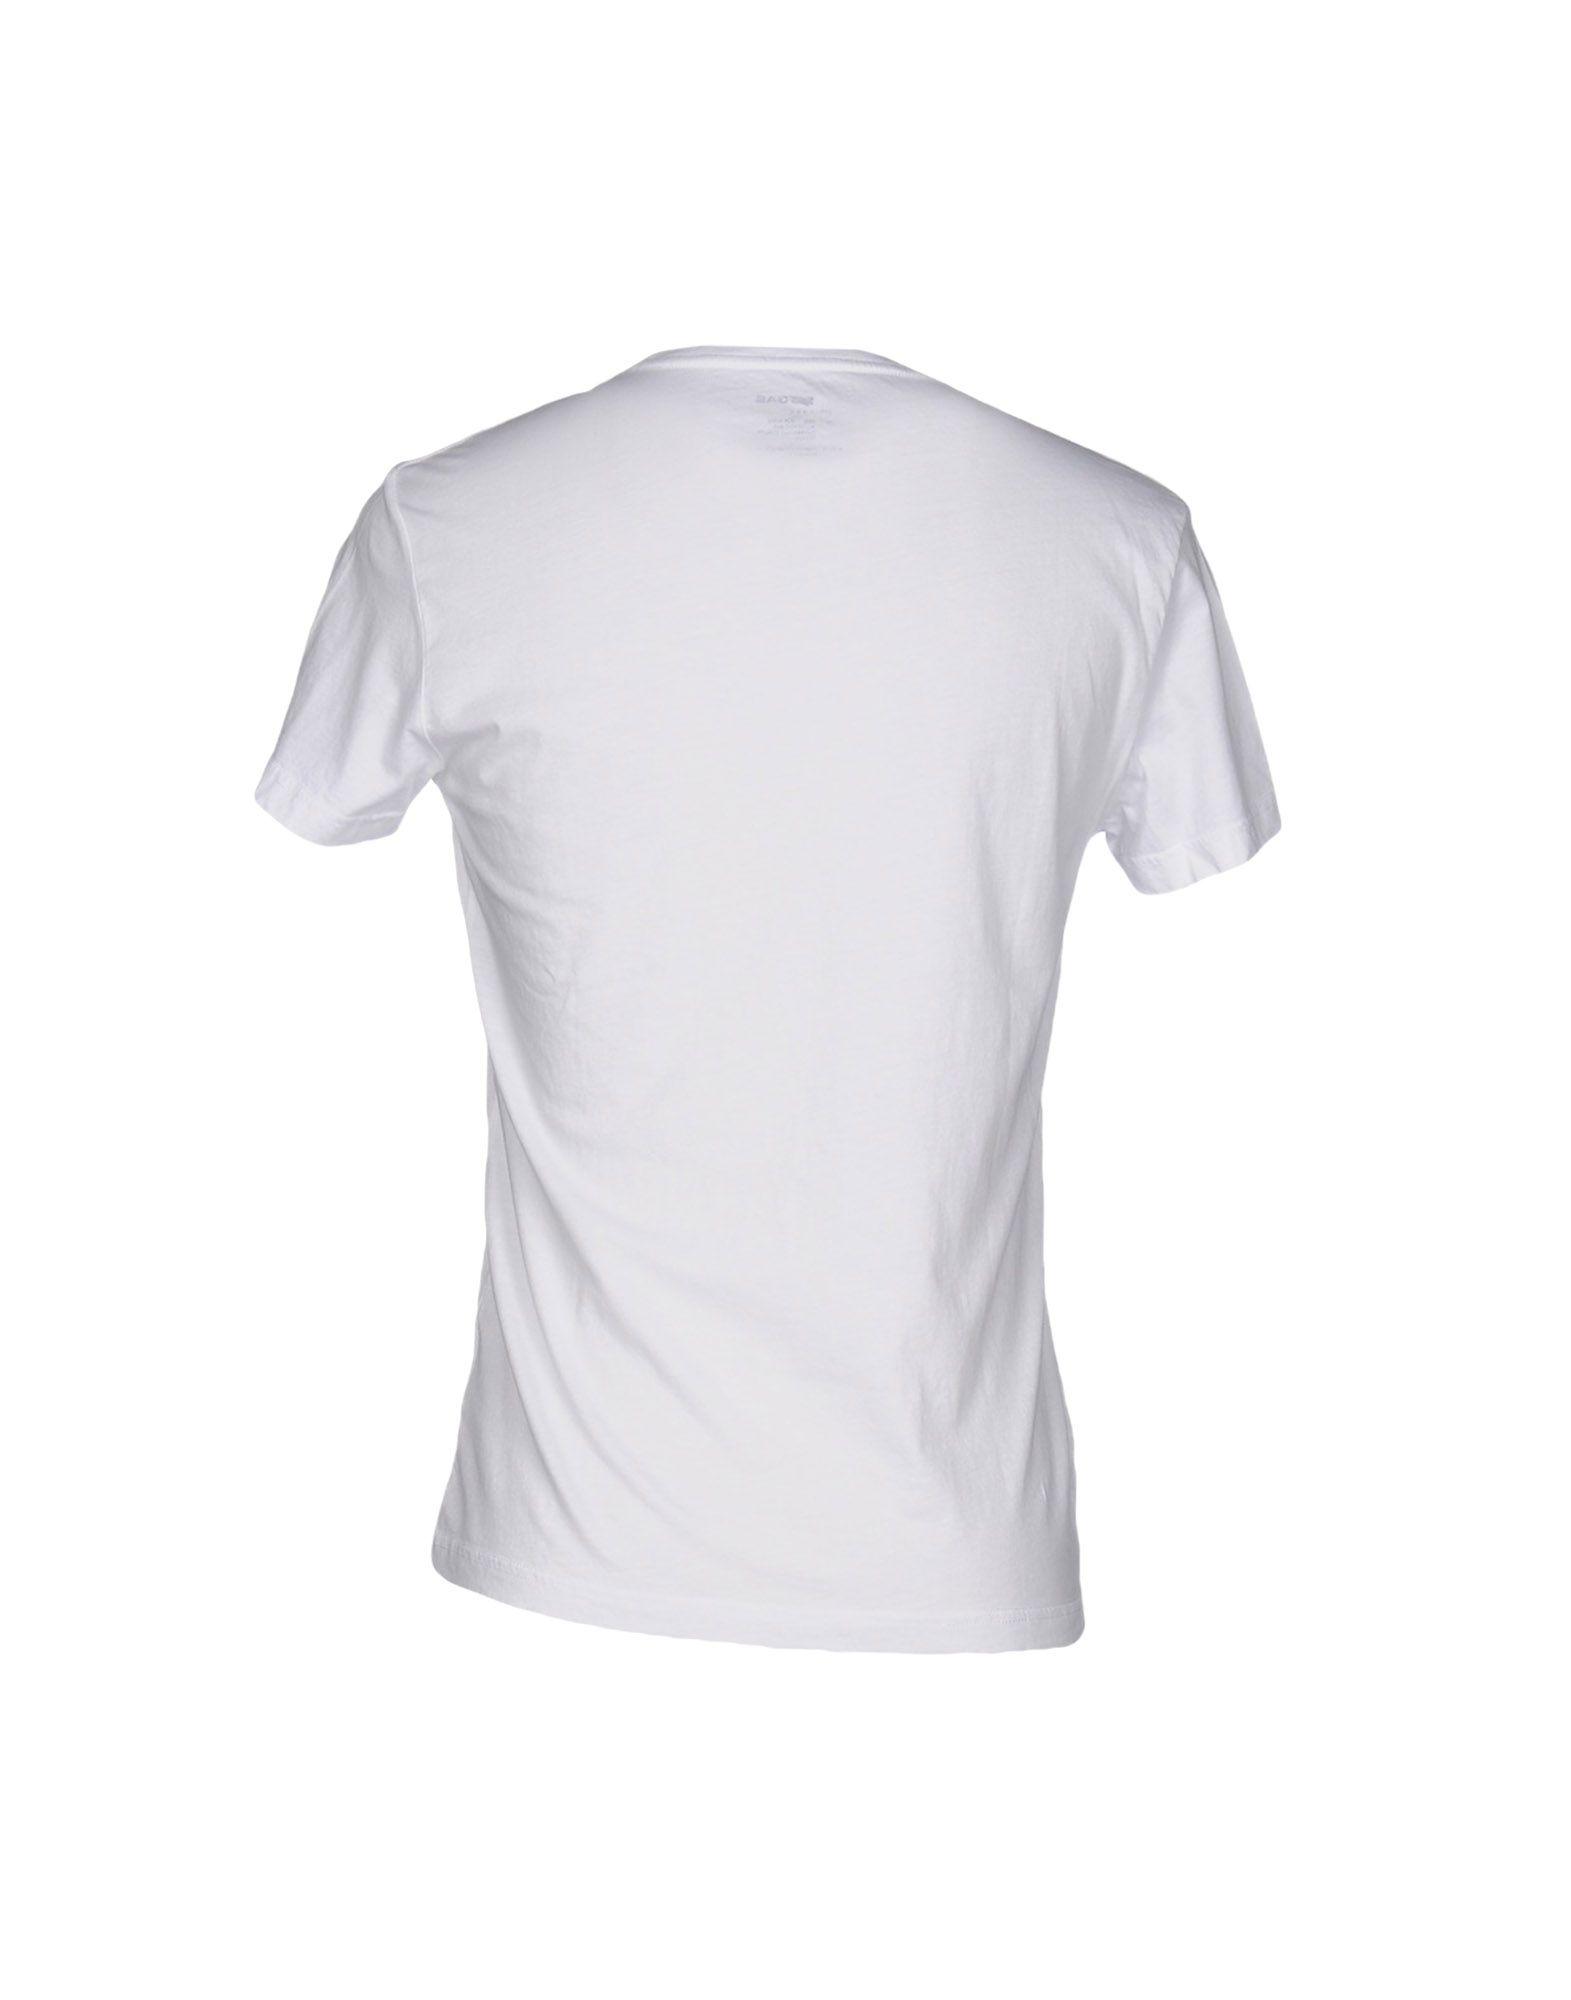 A buon mercato A buon mercato T-Shirt Gas Uomo - - Uomo 12007543HC 1cdc36